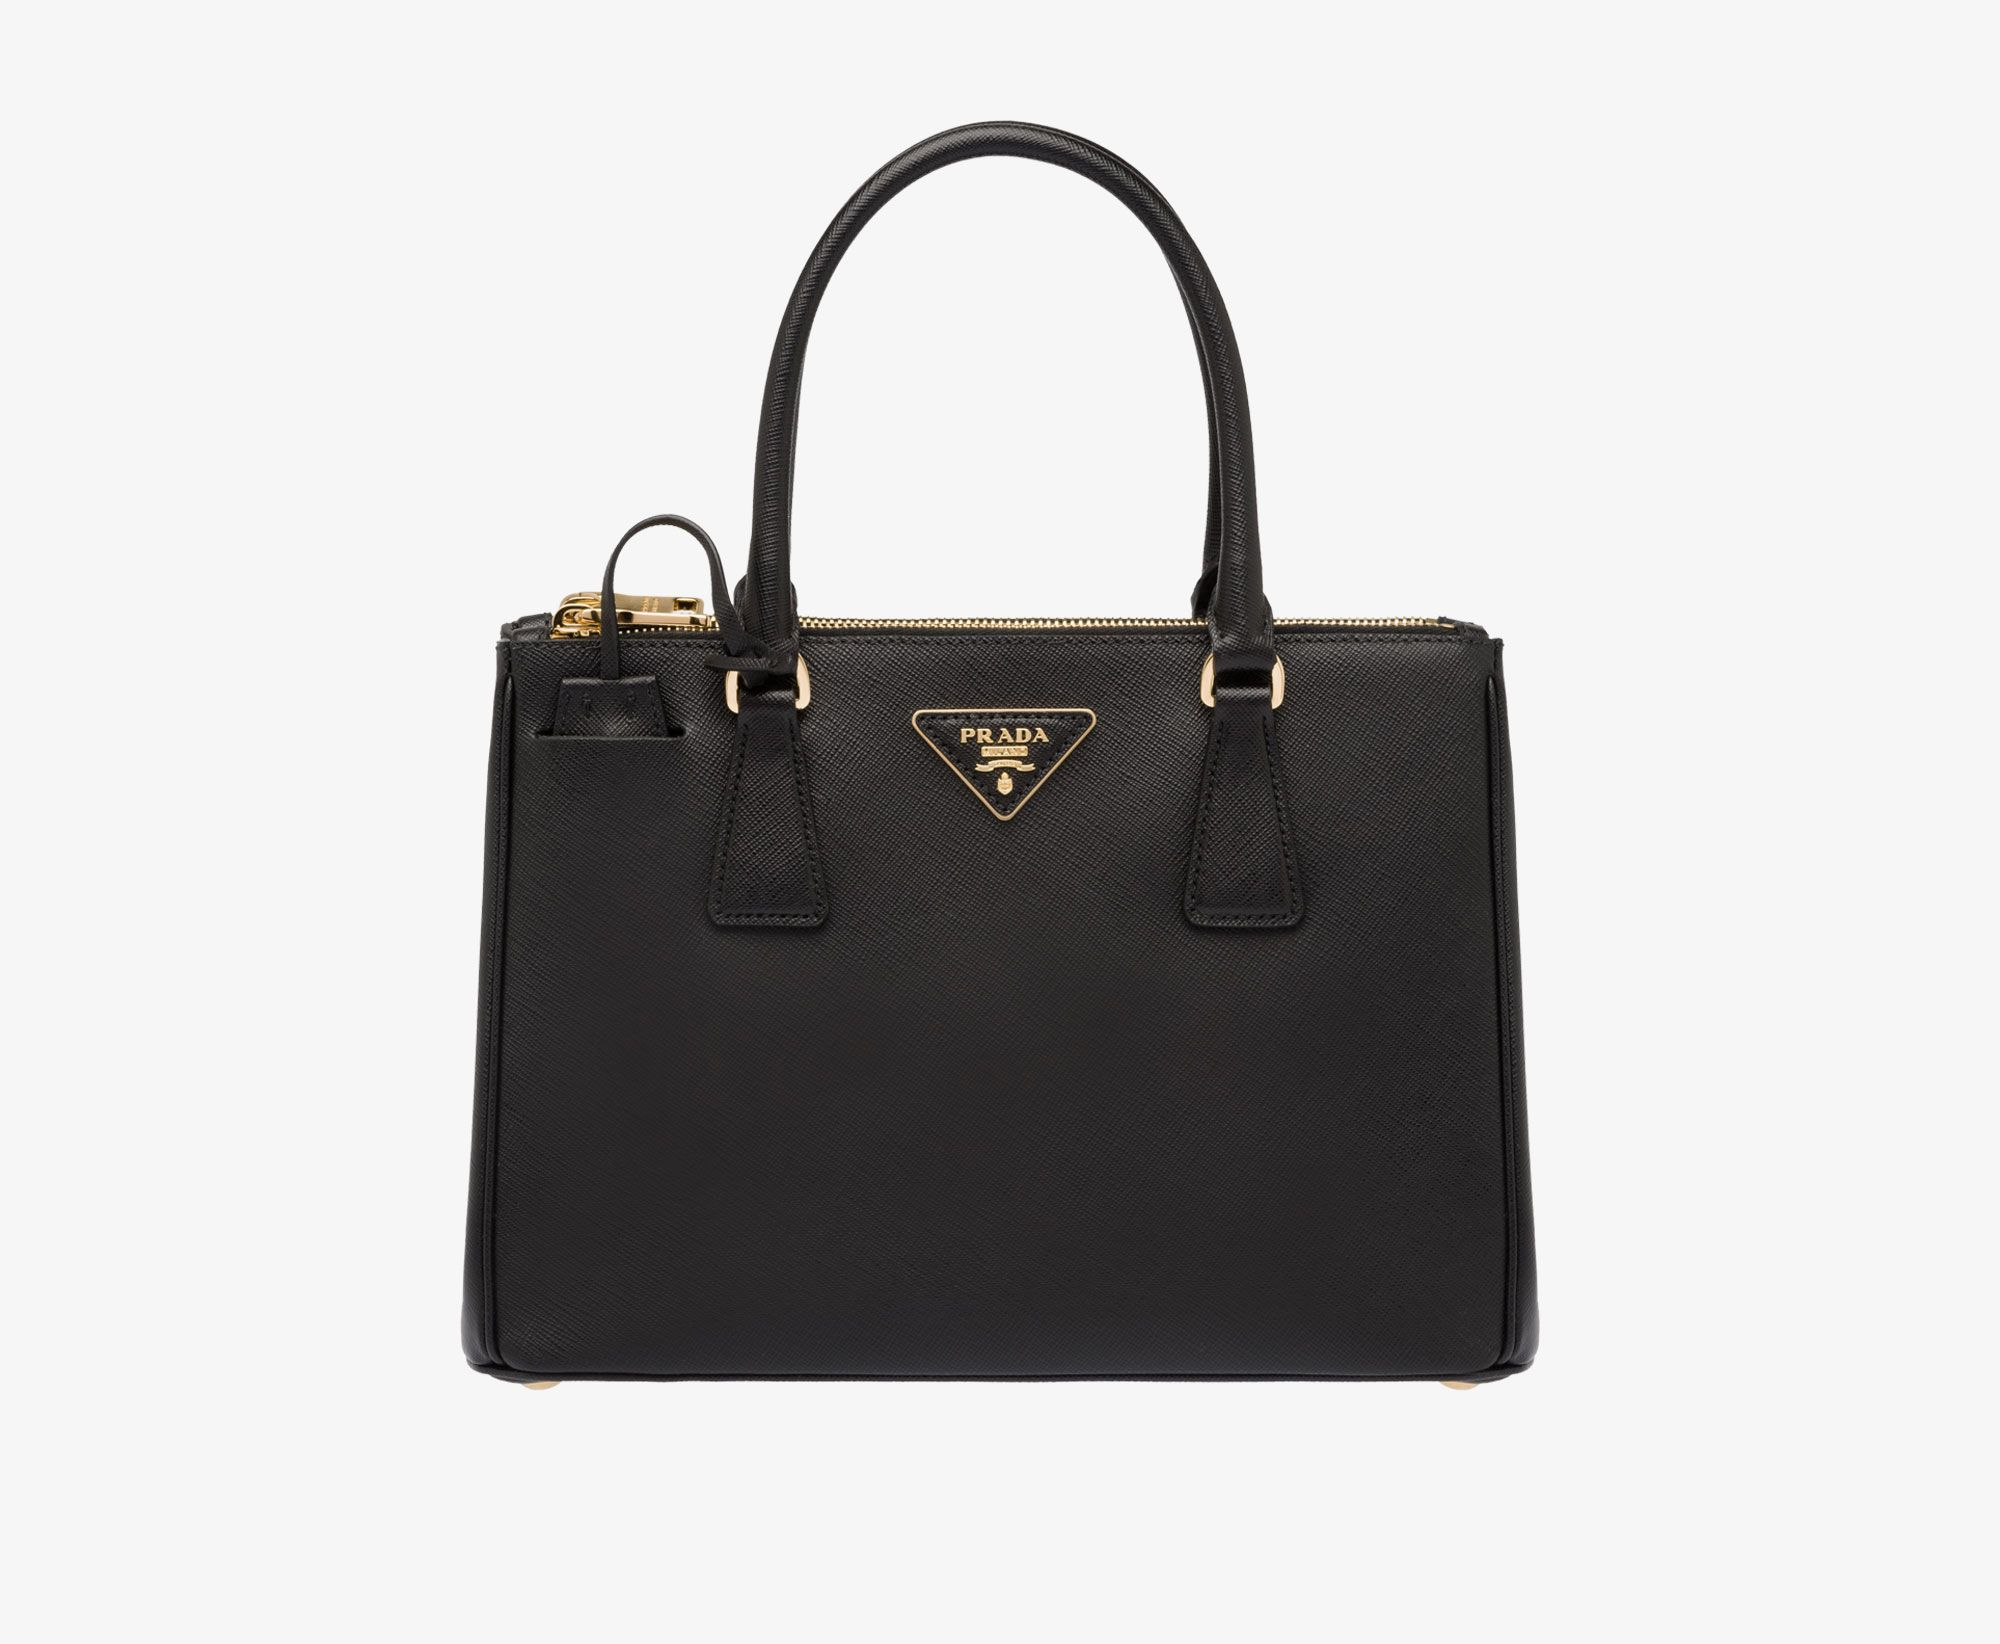 4305c36302 new zealand prada tote handbag gift c7e76 bfe96